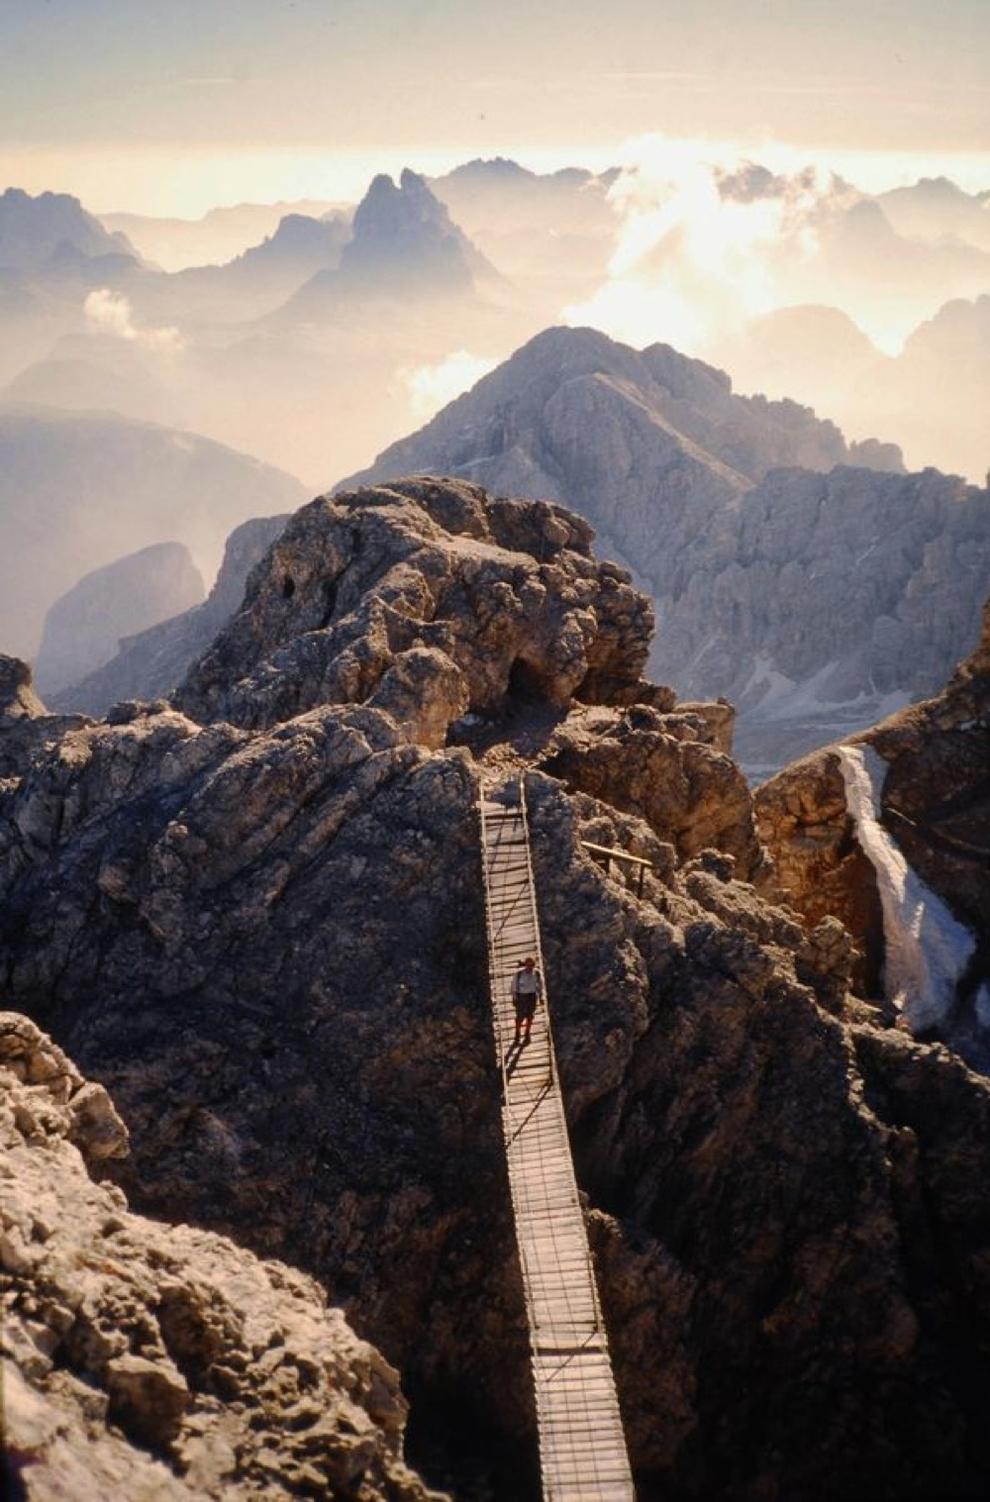 Monte Cristallo, Dolomites of Trentino, Italy.